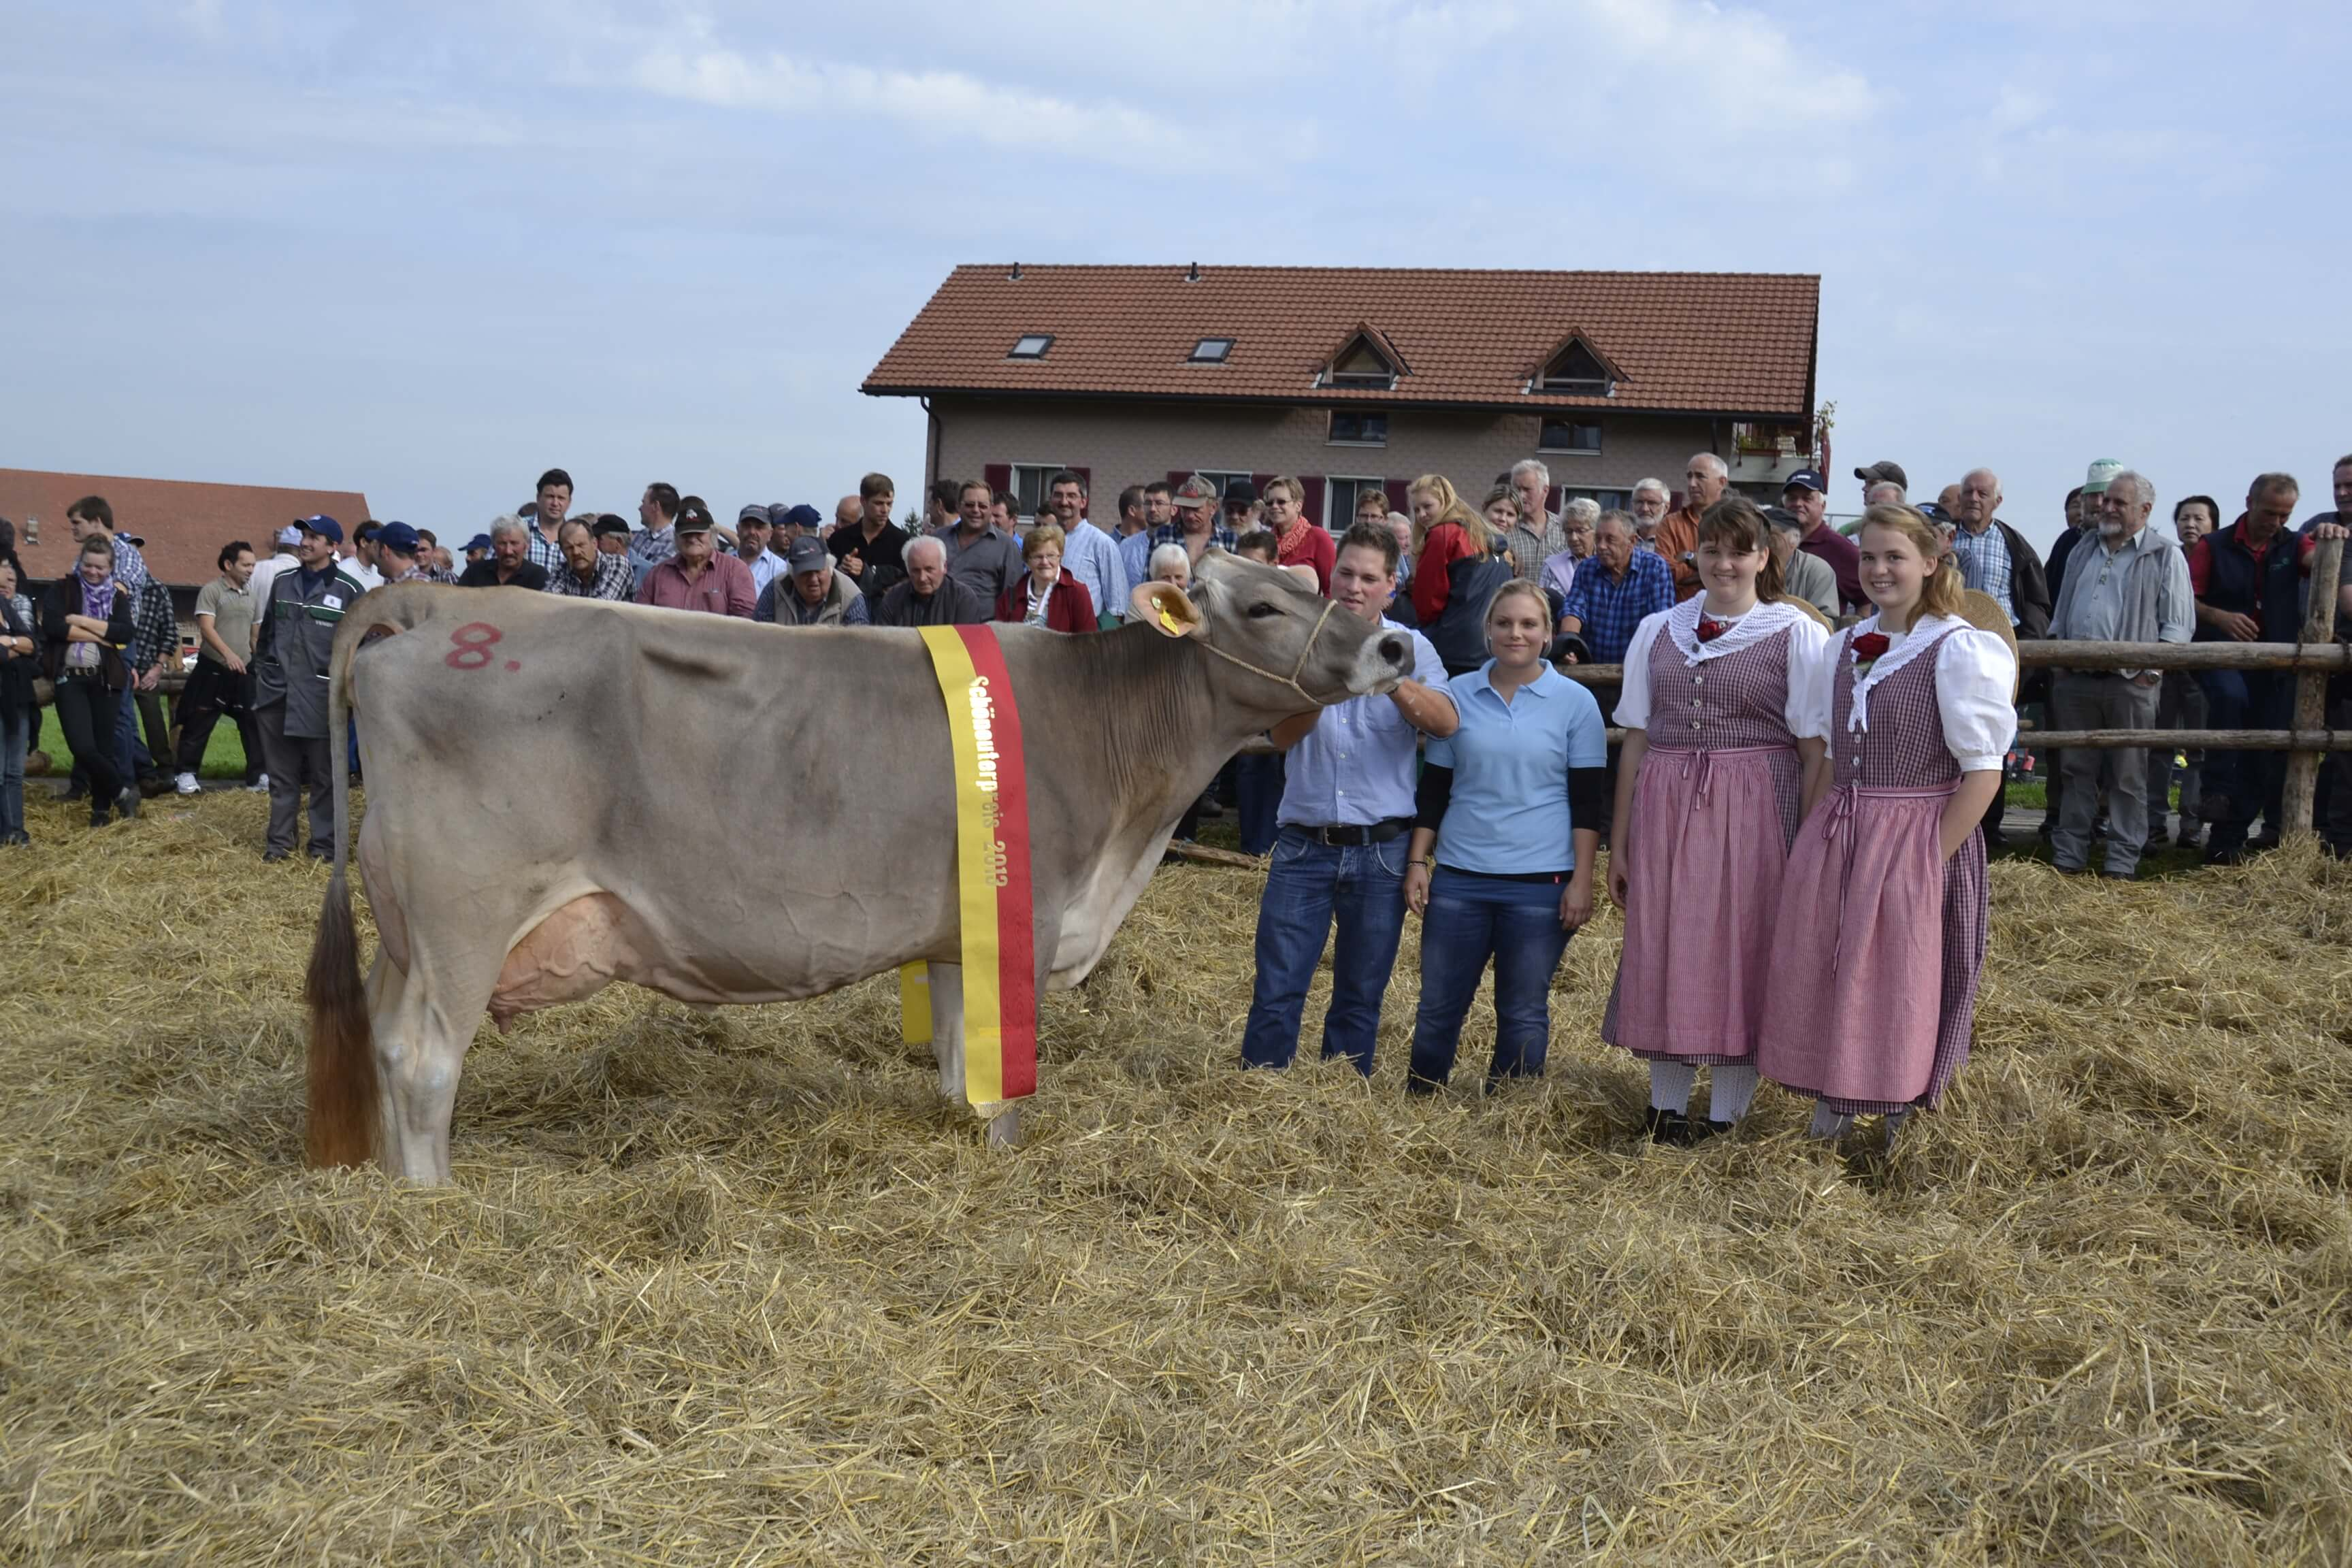 Schoeneuter aeltere Kuehe, Elke, Schatt Armin, Bleiken, Feusisberg